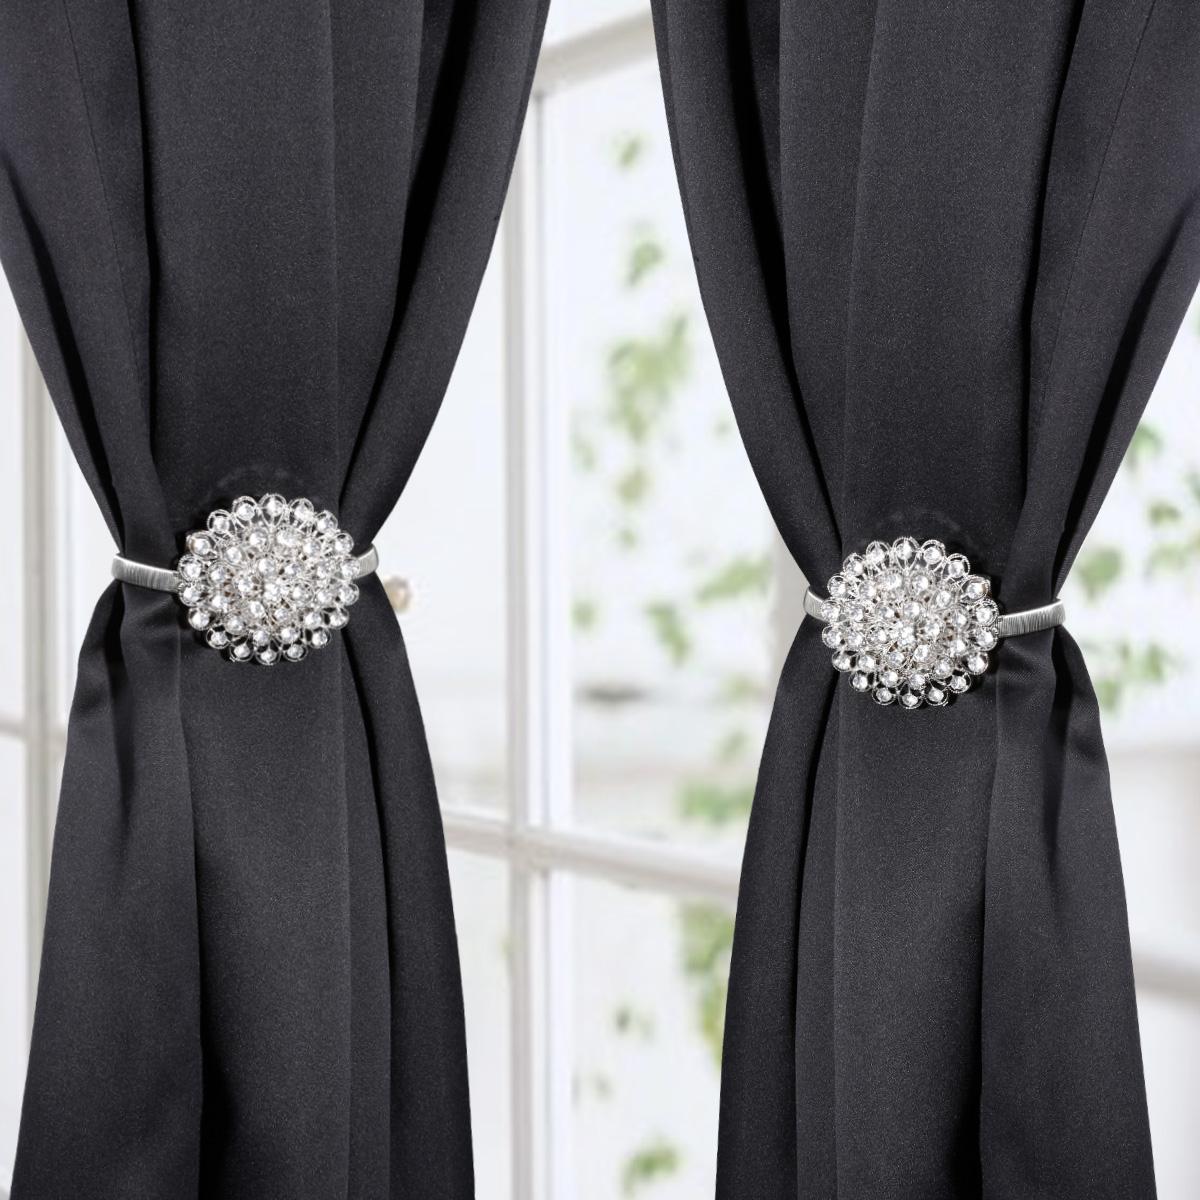 embrasse rideau fashion designs. Black Bedroom Furniture Sets. Home Design Ideas